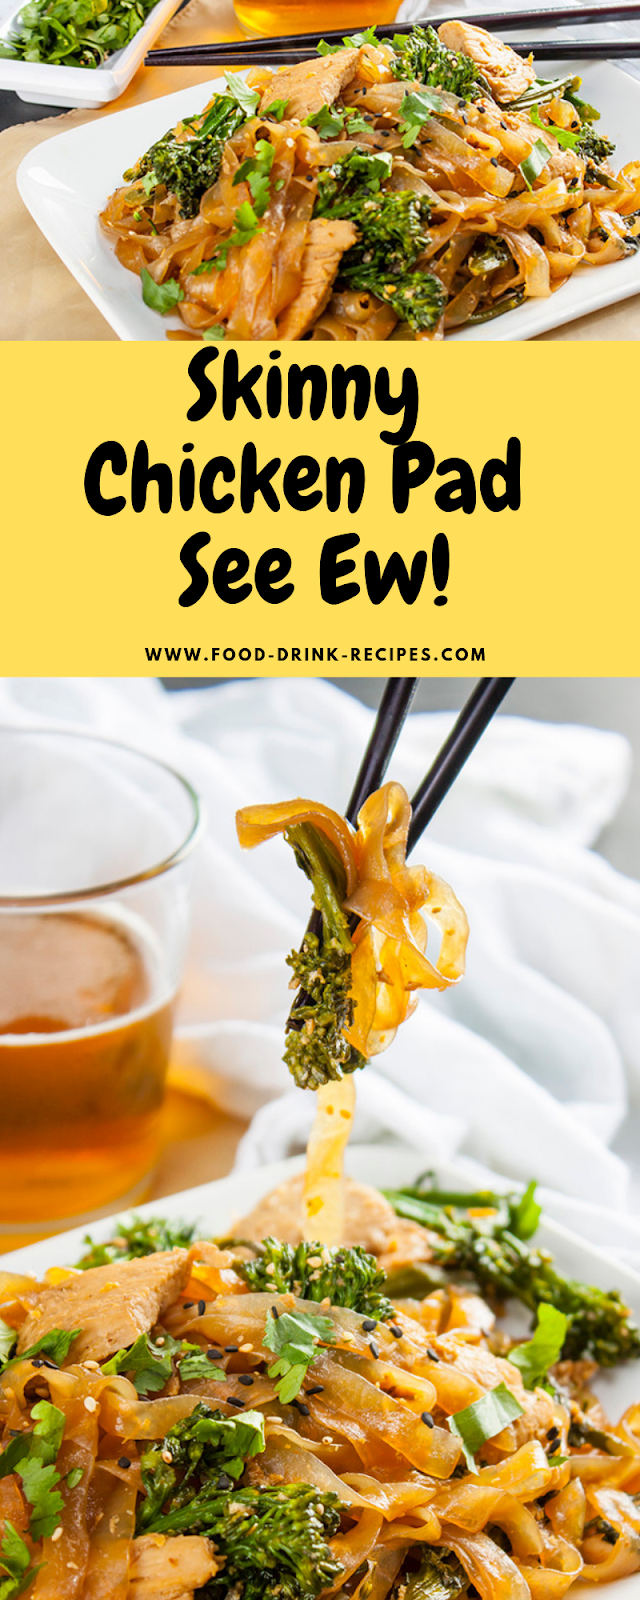 Skinny Chicken Pad See Ew